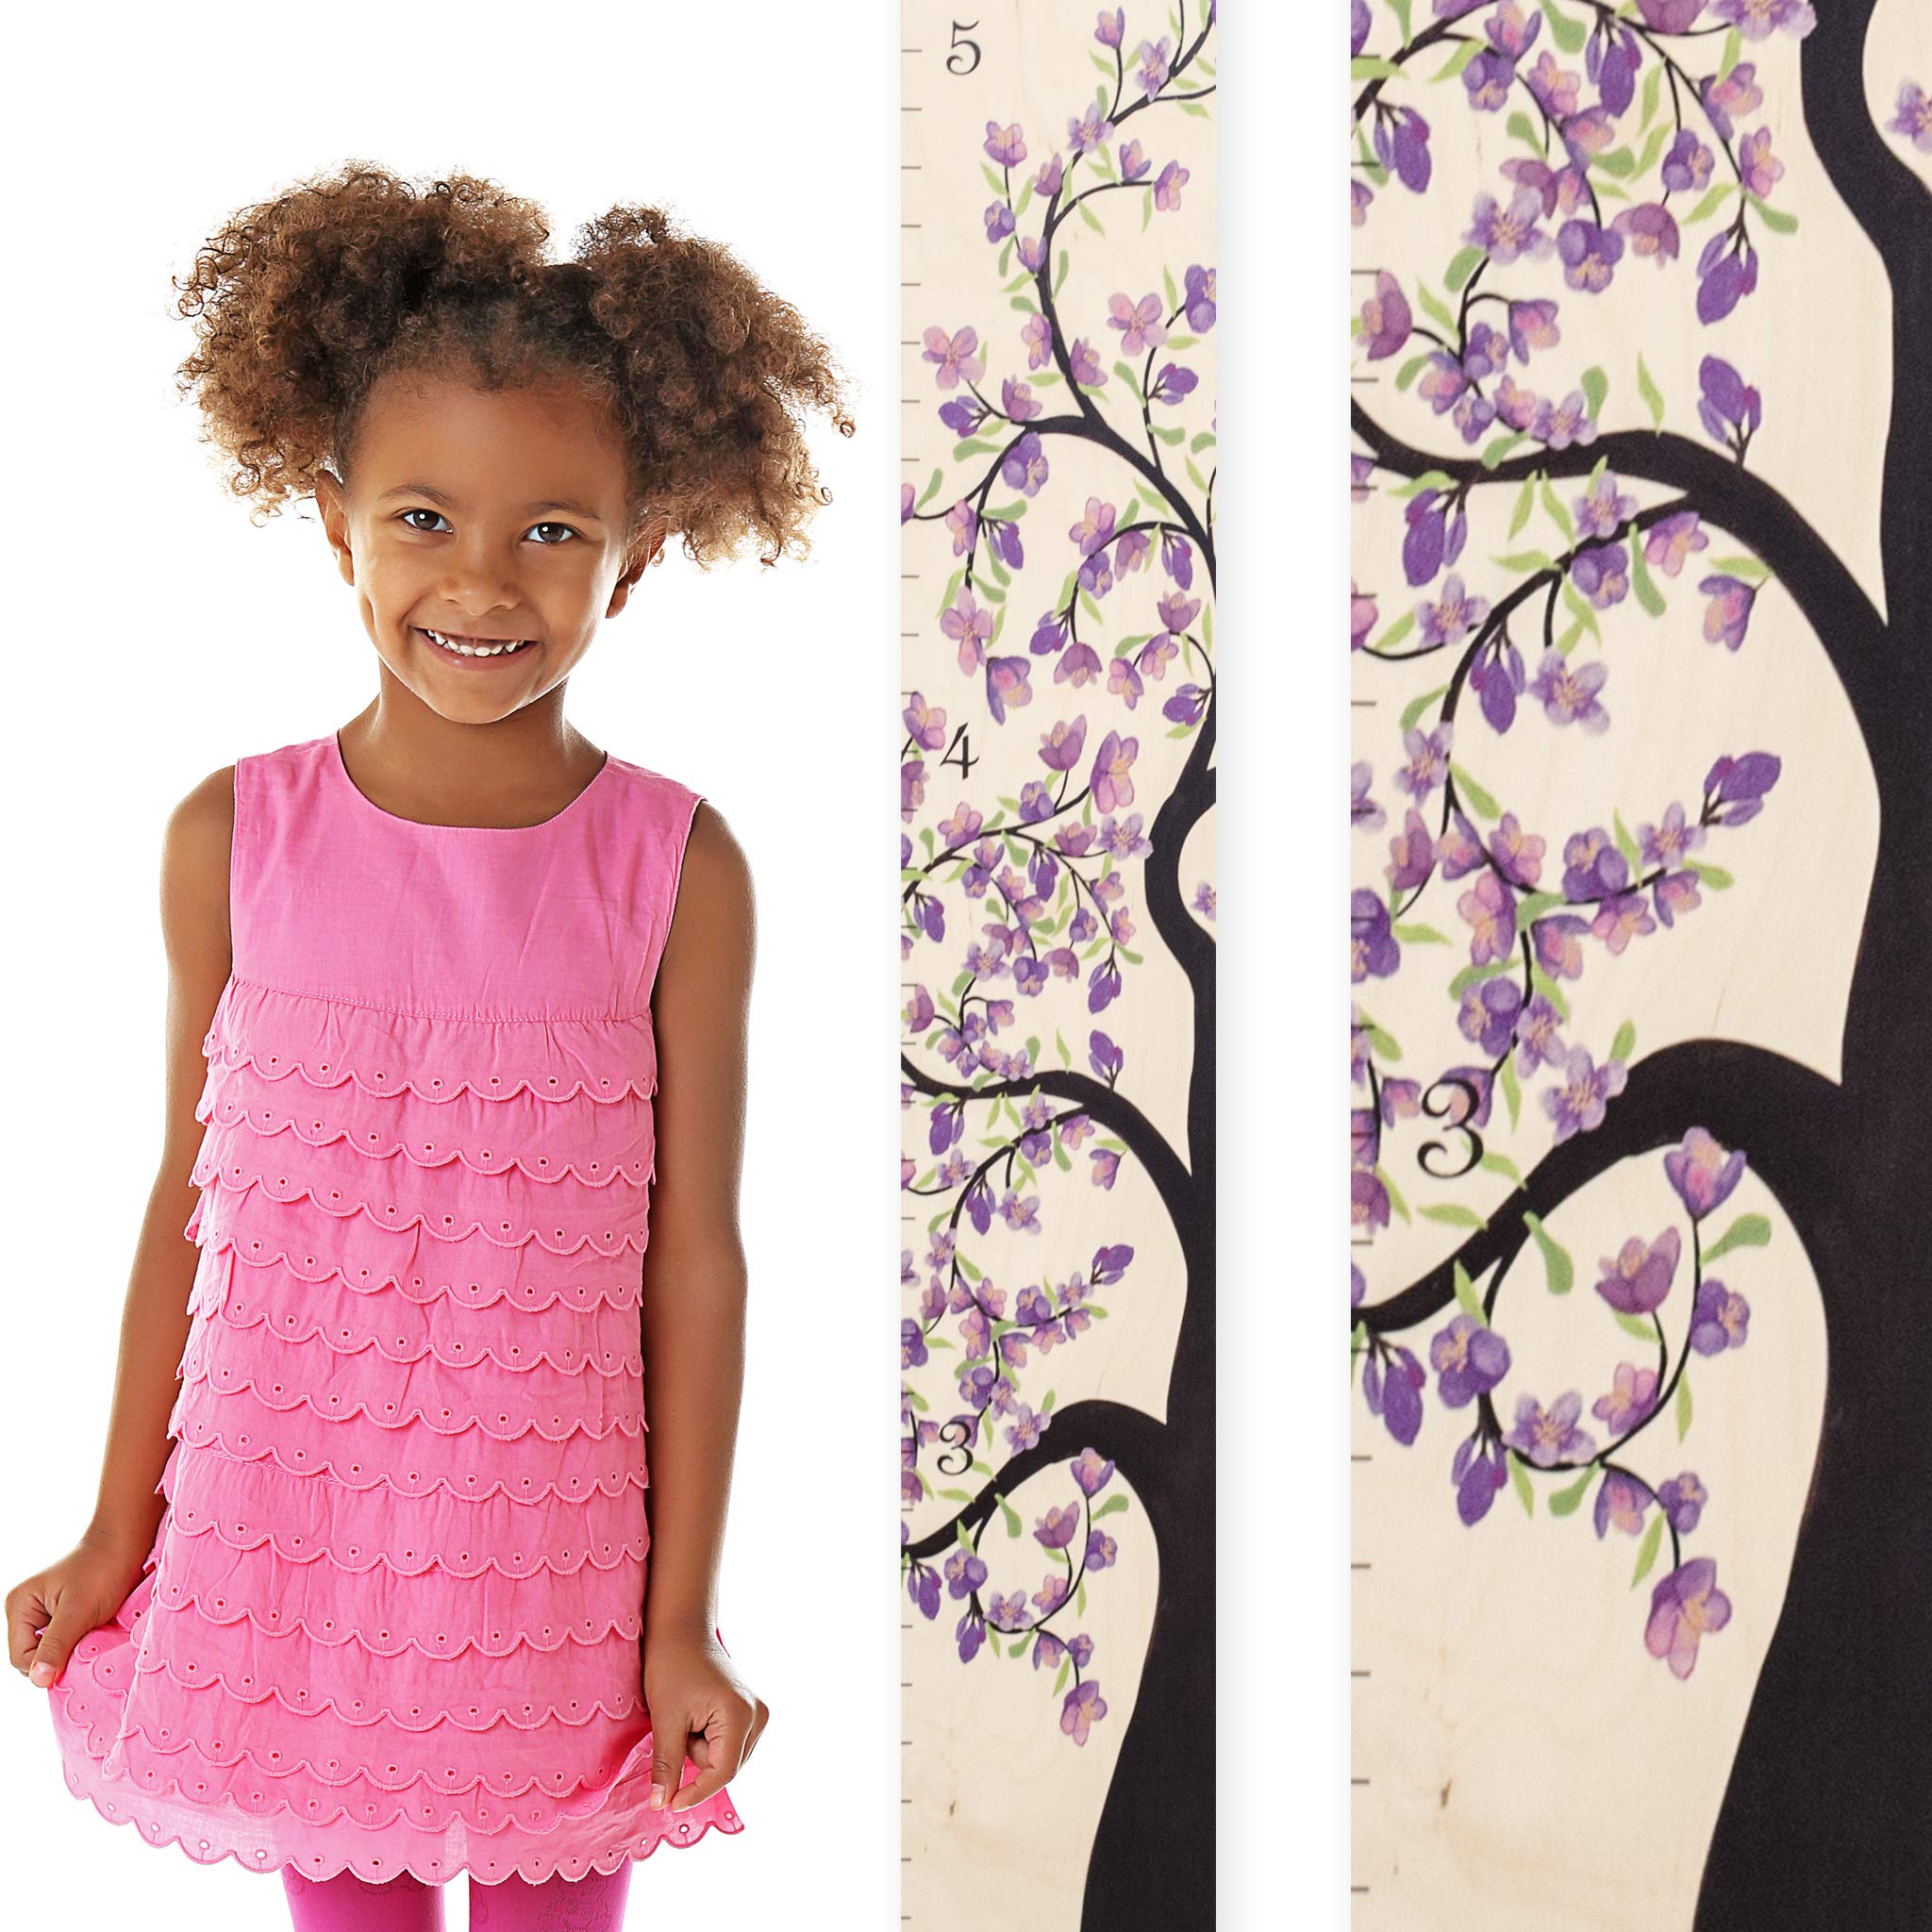 Growth Chart Art | Wooden Growth Chart Girls, Boys | Measuring Kids Height Wall Décor | Flower Growth Chart Ruler | Tree of Life Purple